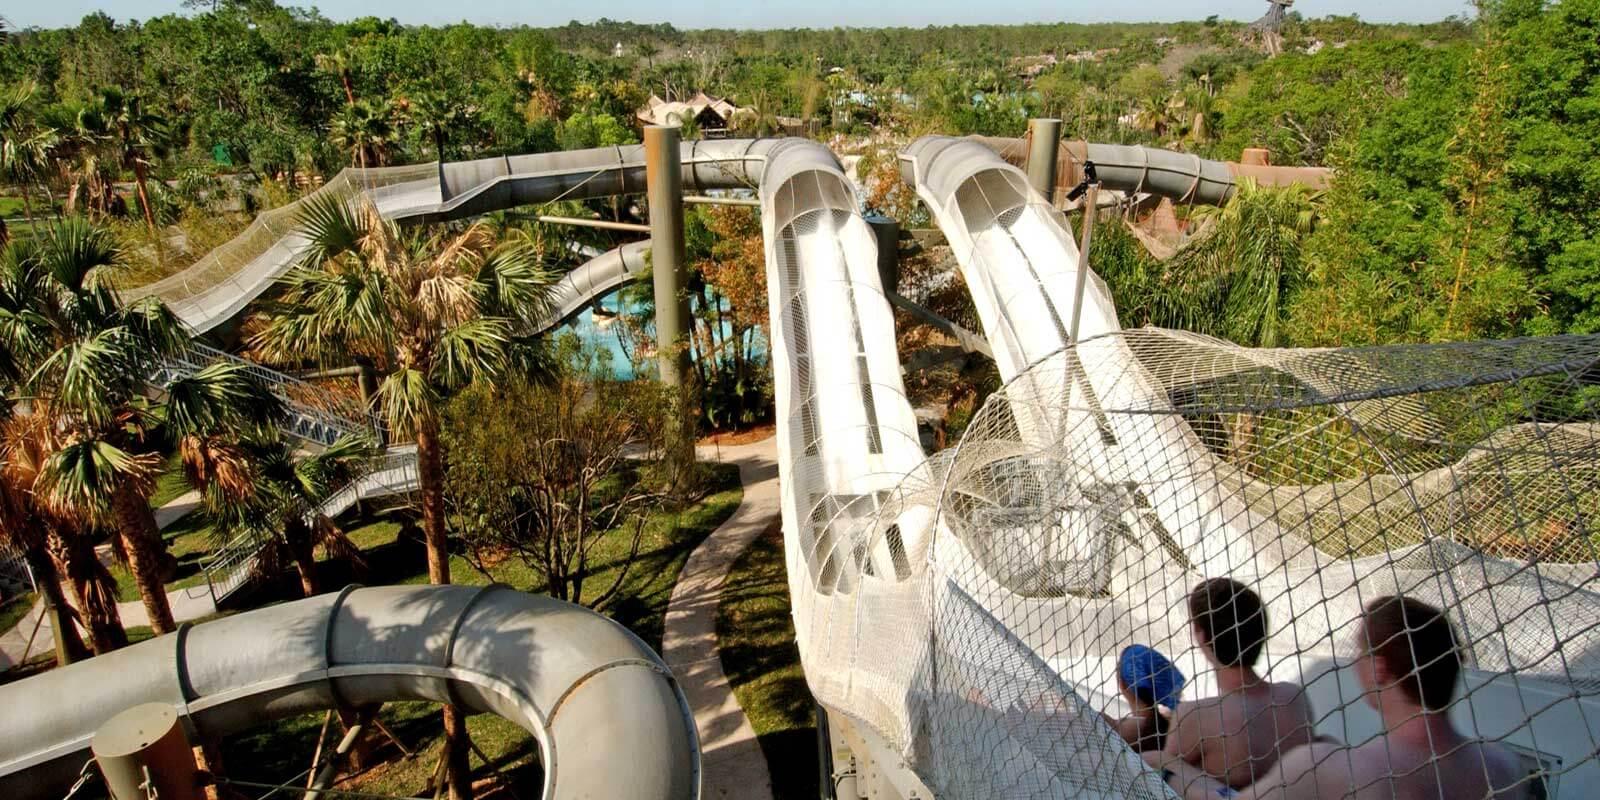 Landscape photo of the Crush n Gusher water slide at Disney's Typhoon Lagoon.